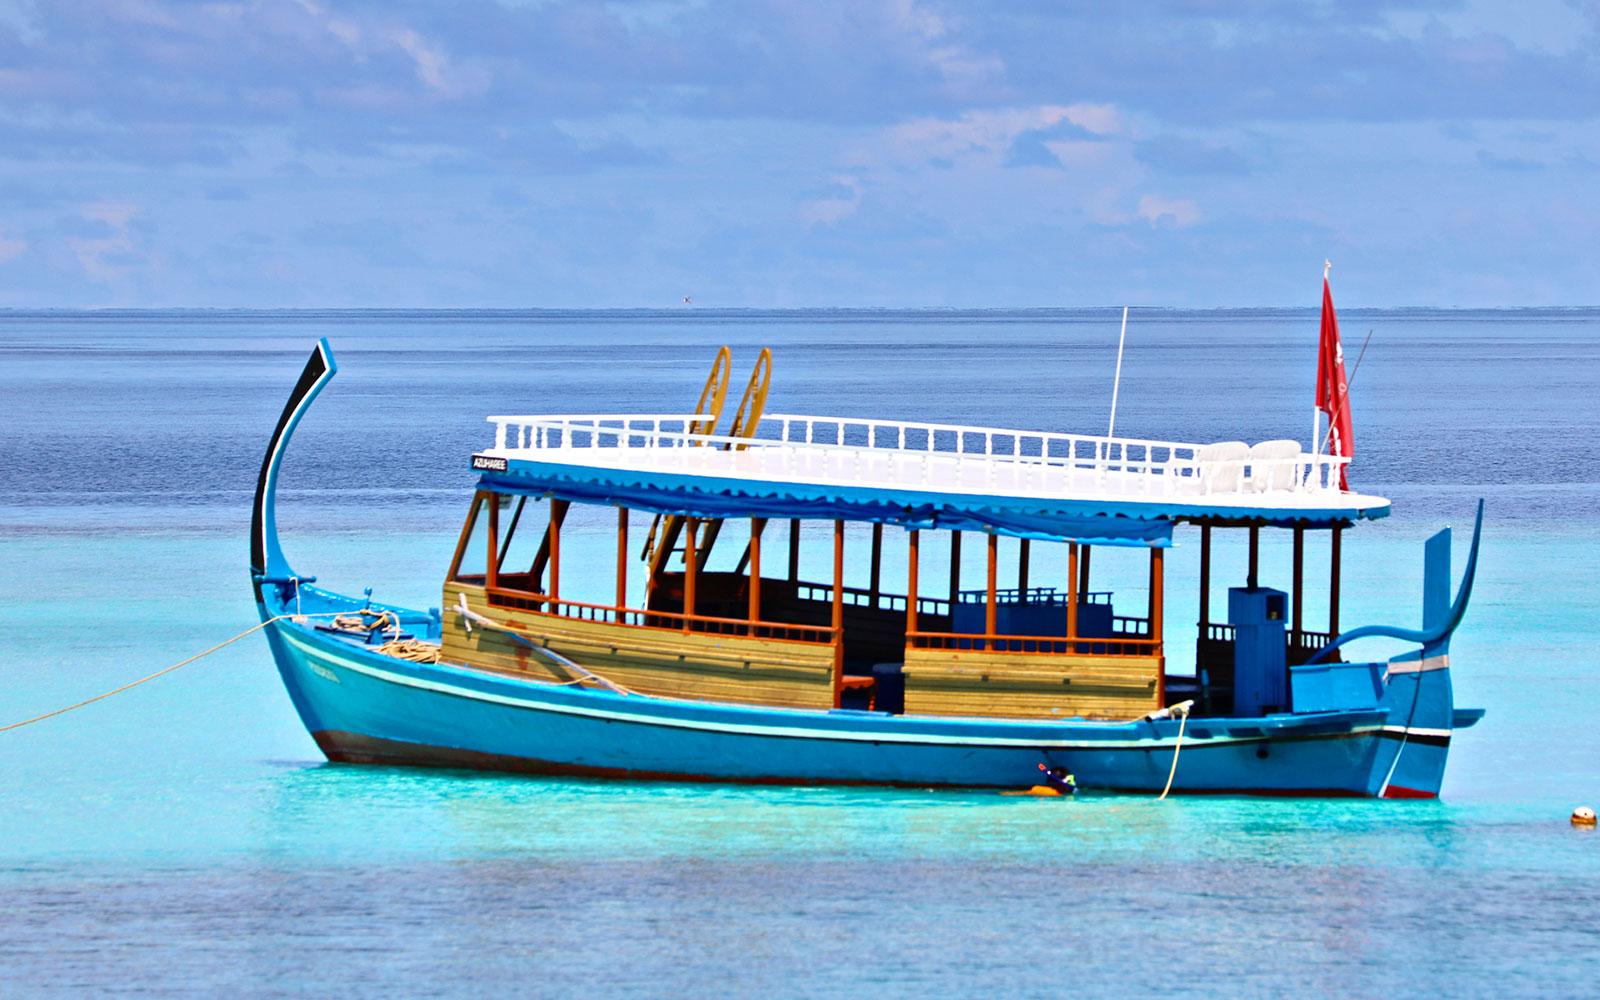 Maldive_271119_1448.jpg